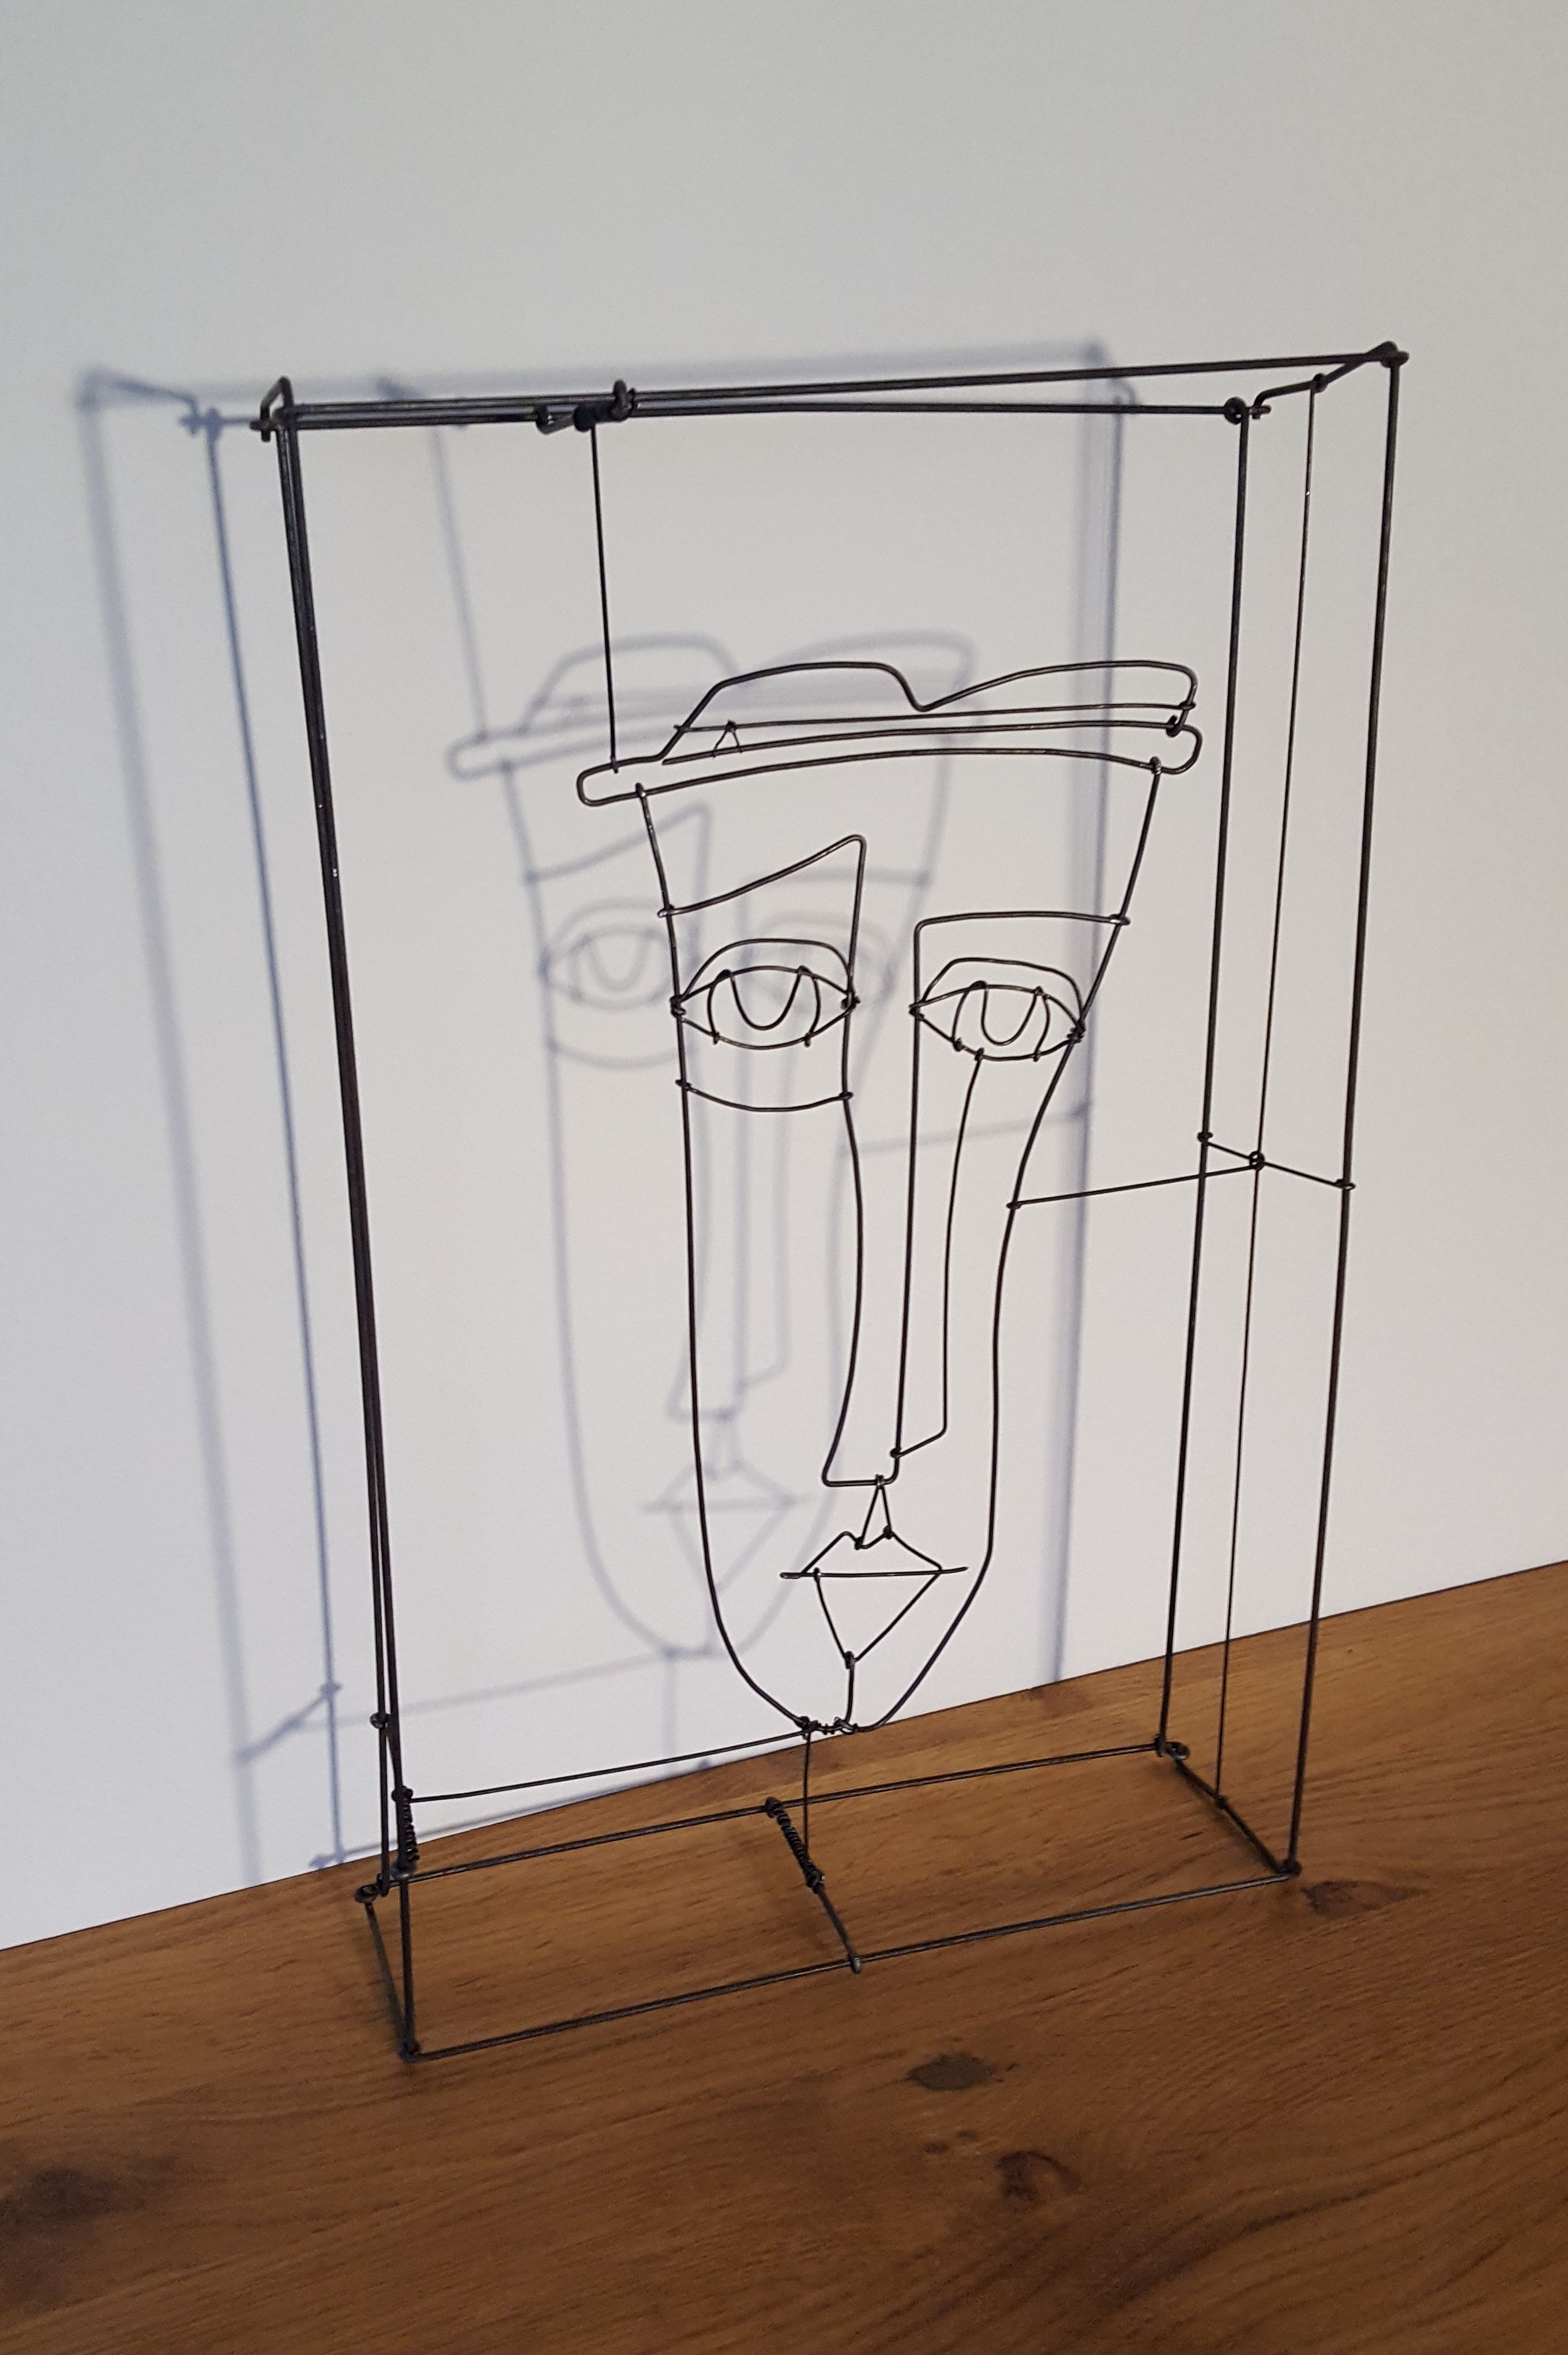 Drahtinform.de Jack | esculturas | Pinterest | Skulptur und ...